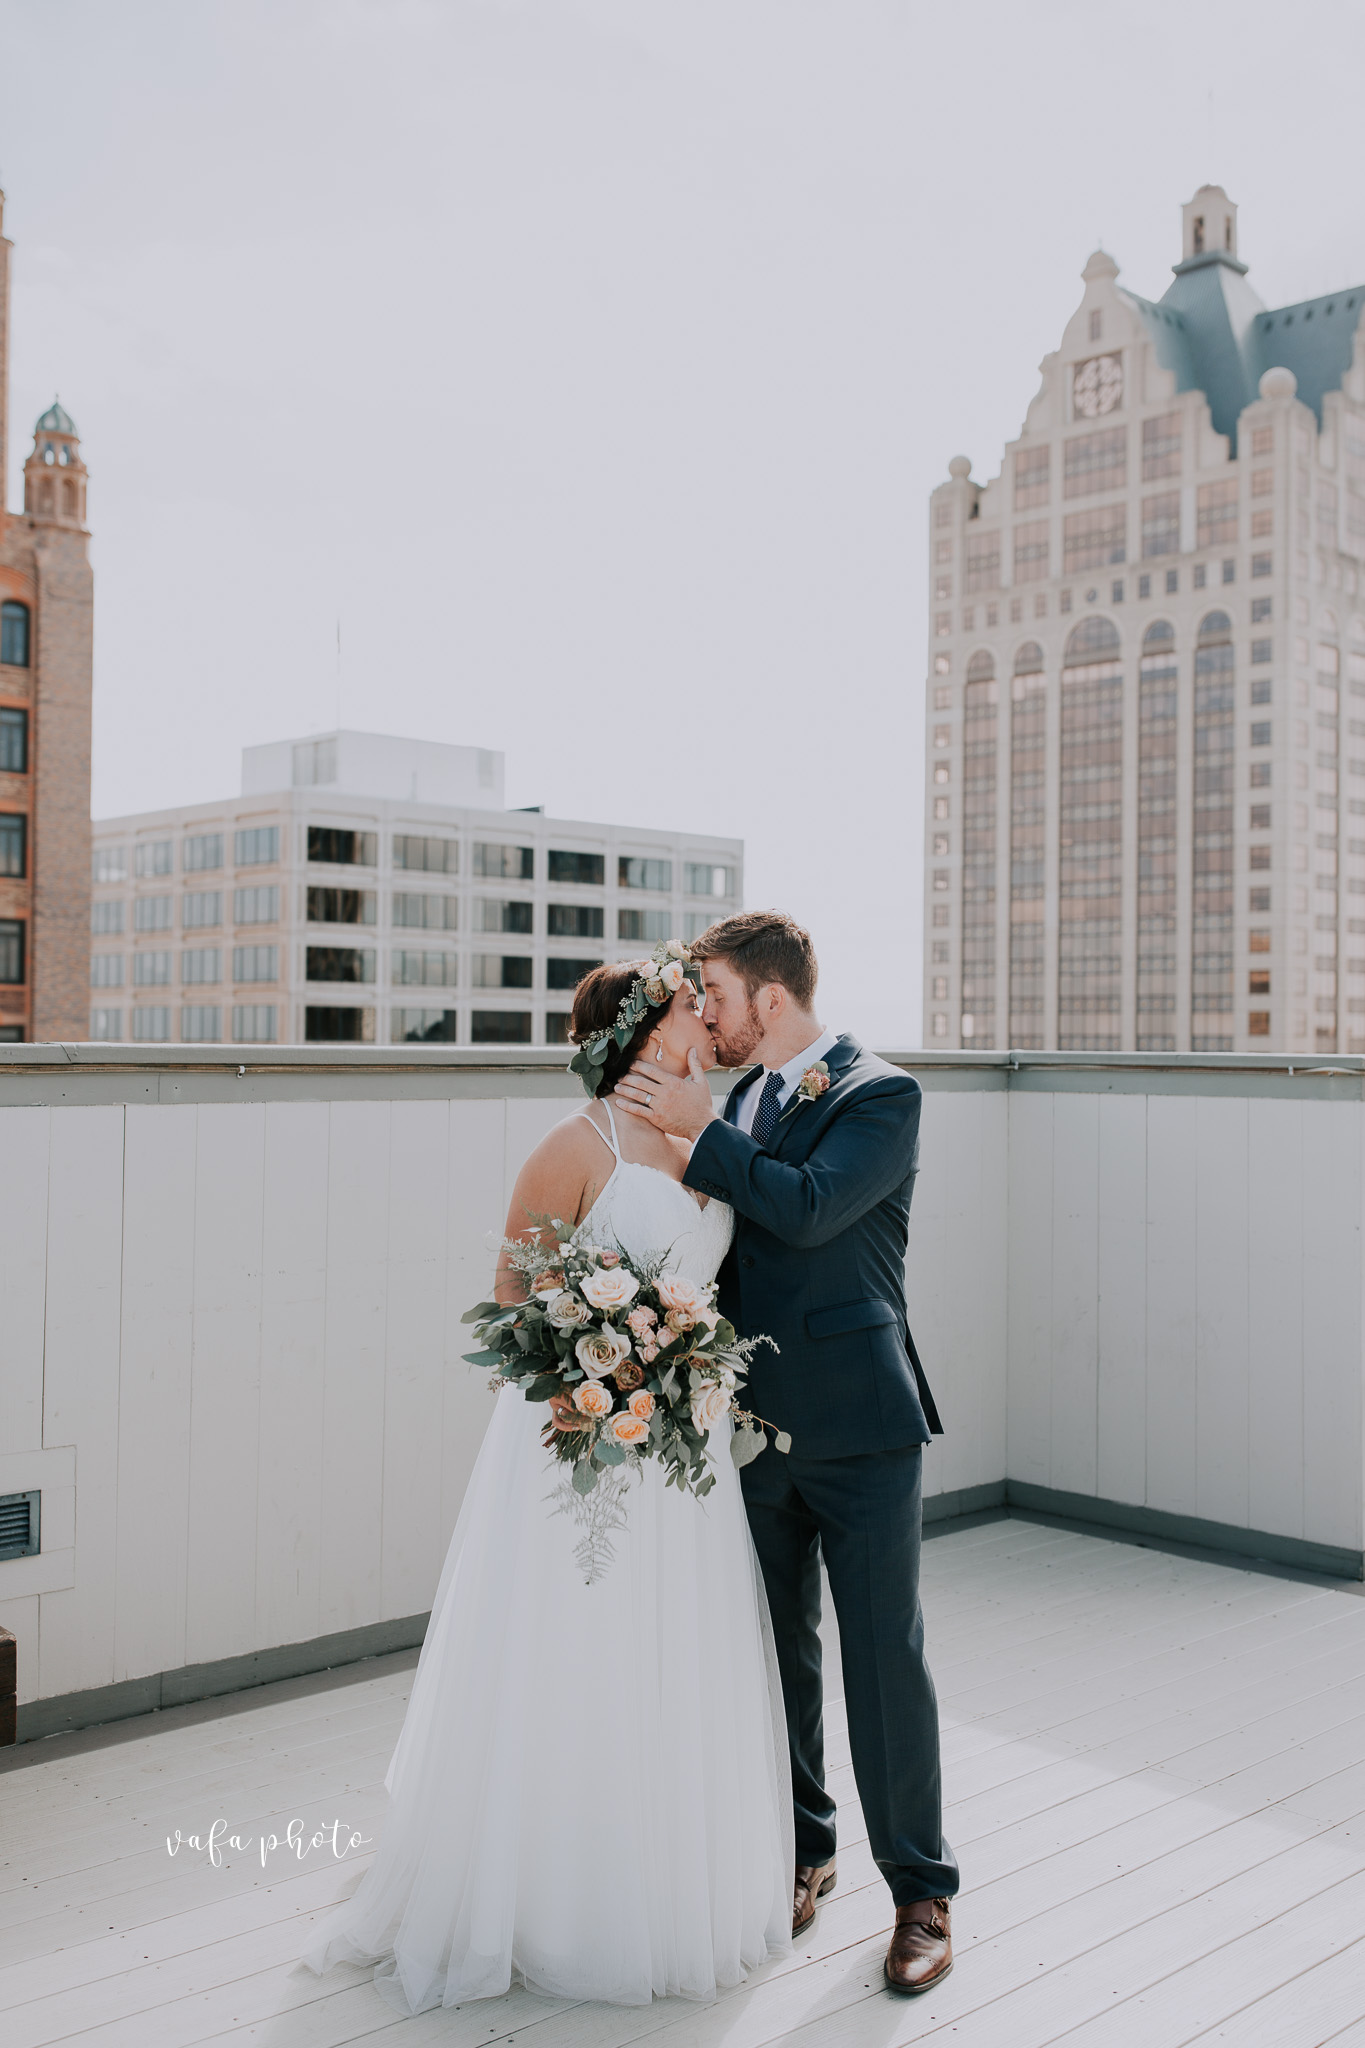 Milwaukee-Athletic-Club-Wedding-Amanda-Tony-Vafa-Photo-451.jpg